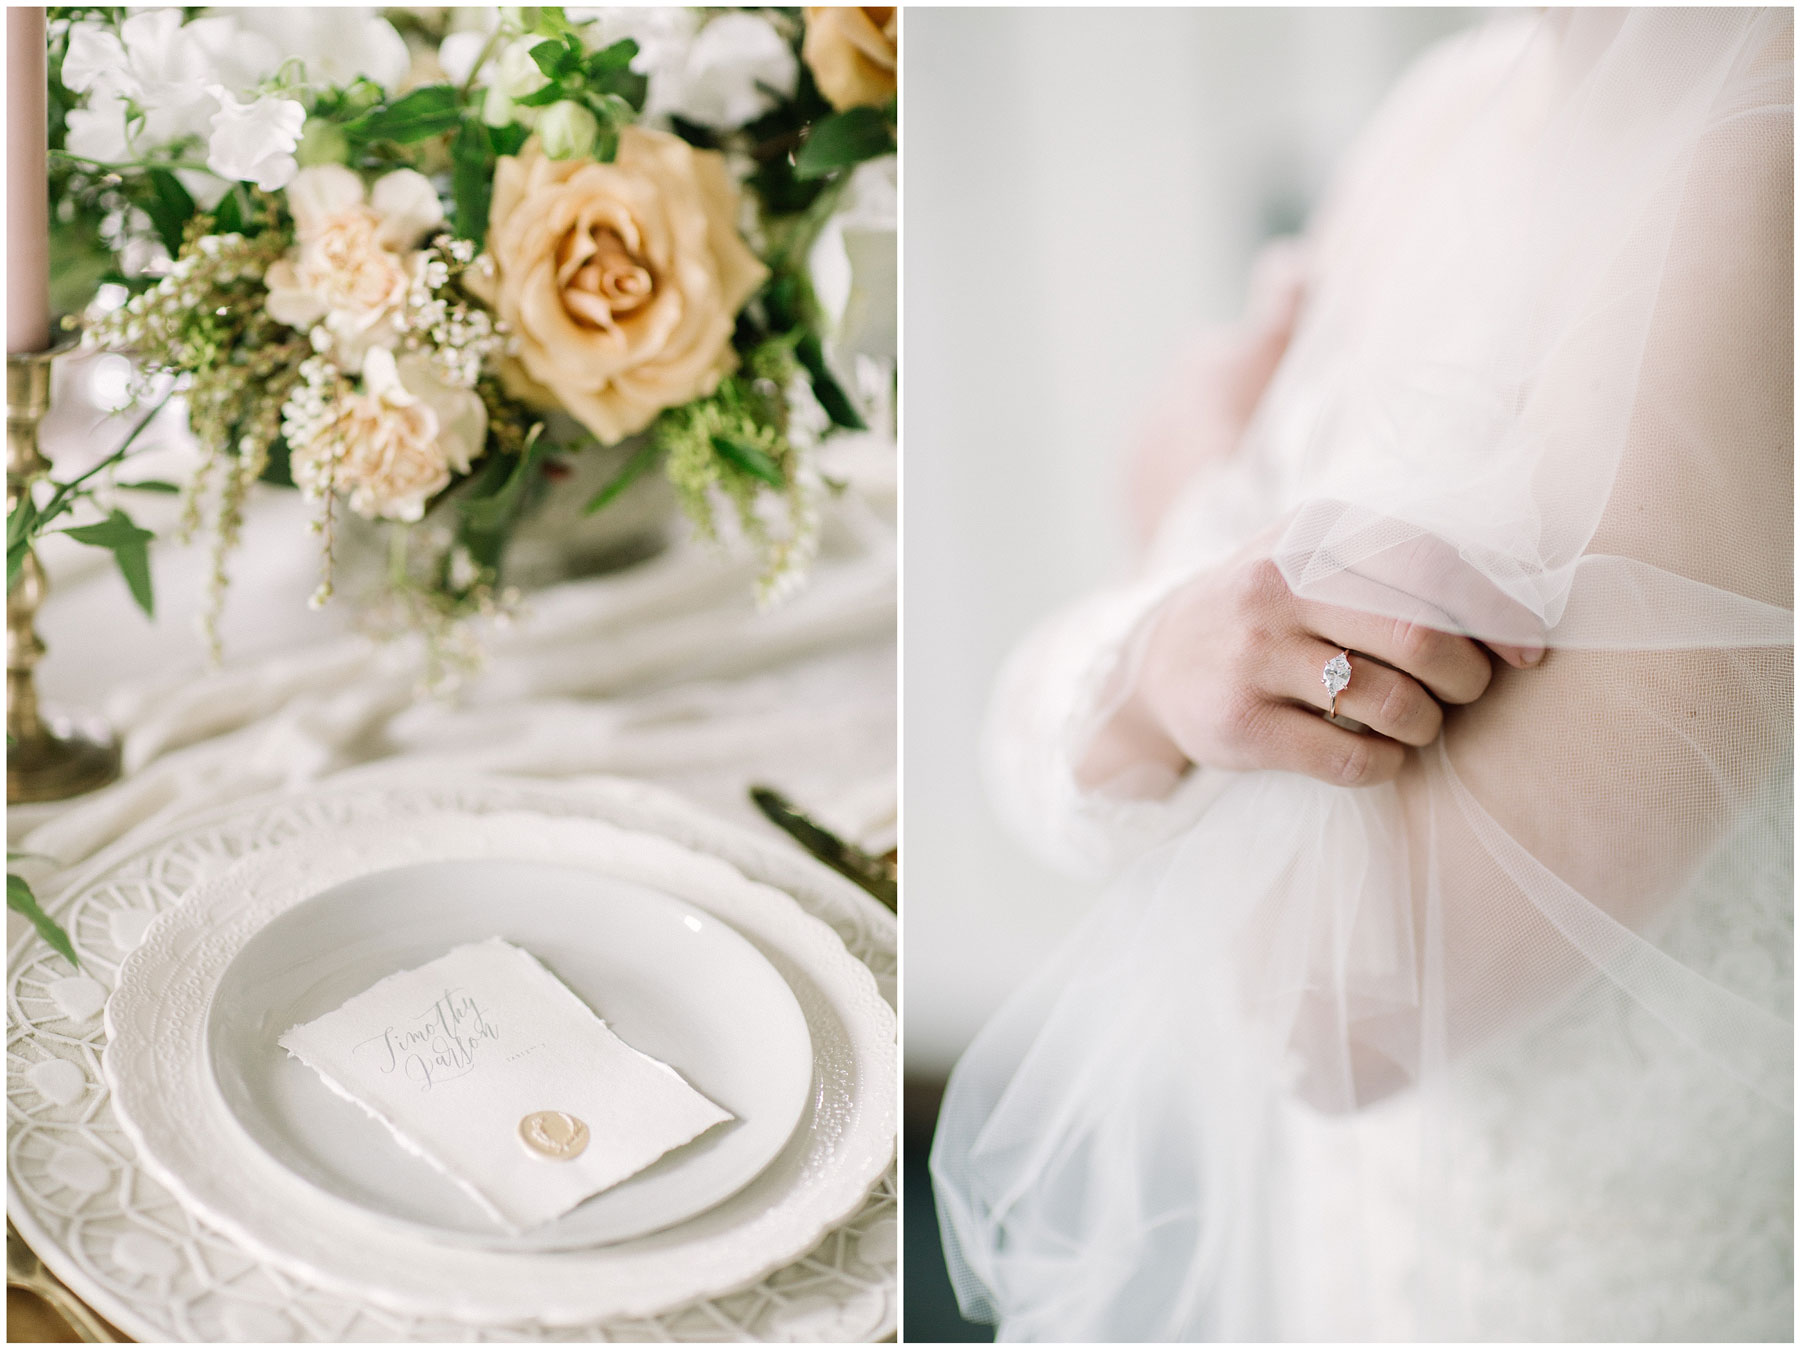 free-wedding-photography-education-webinar-six-figures_0111.jpg